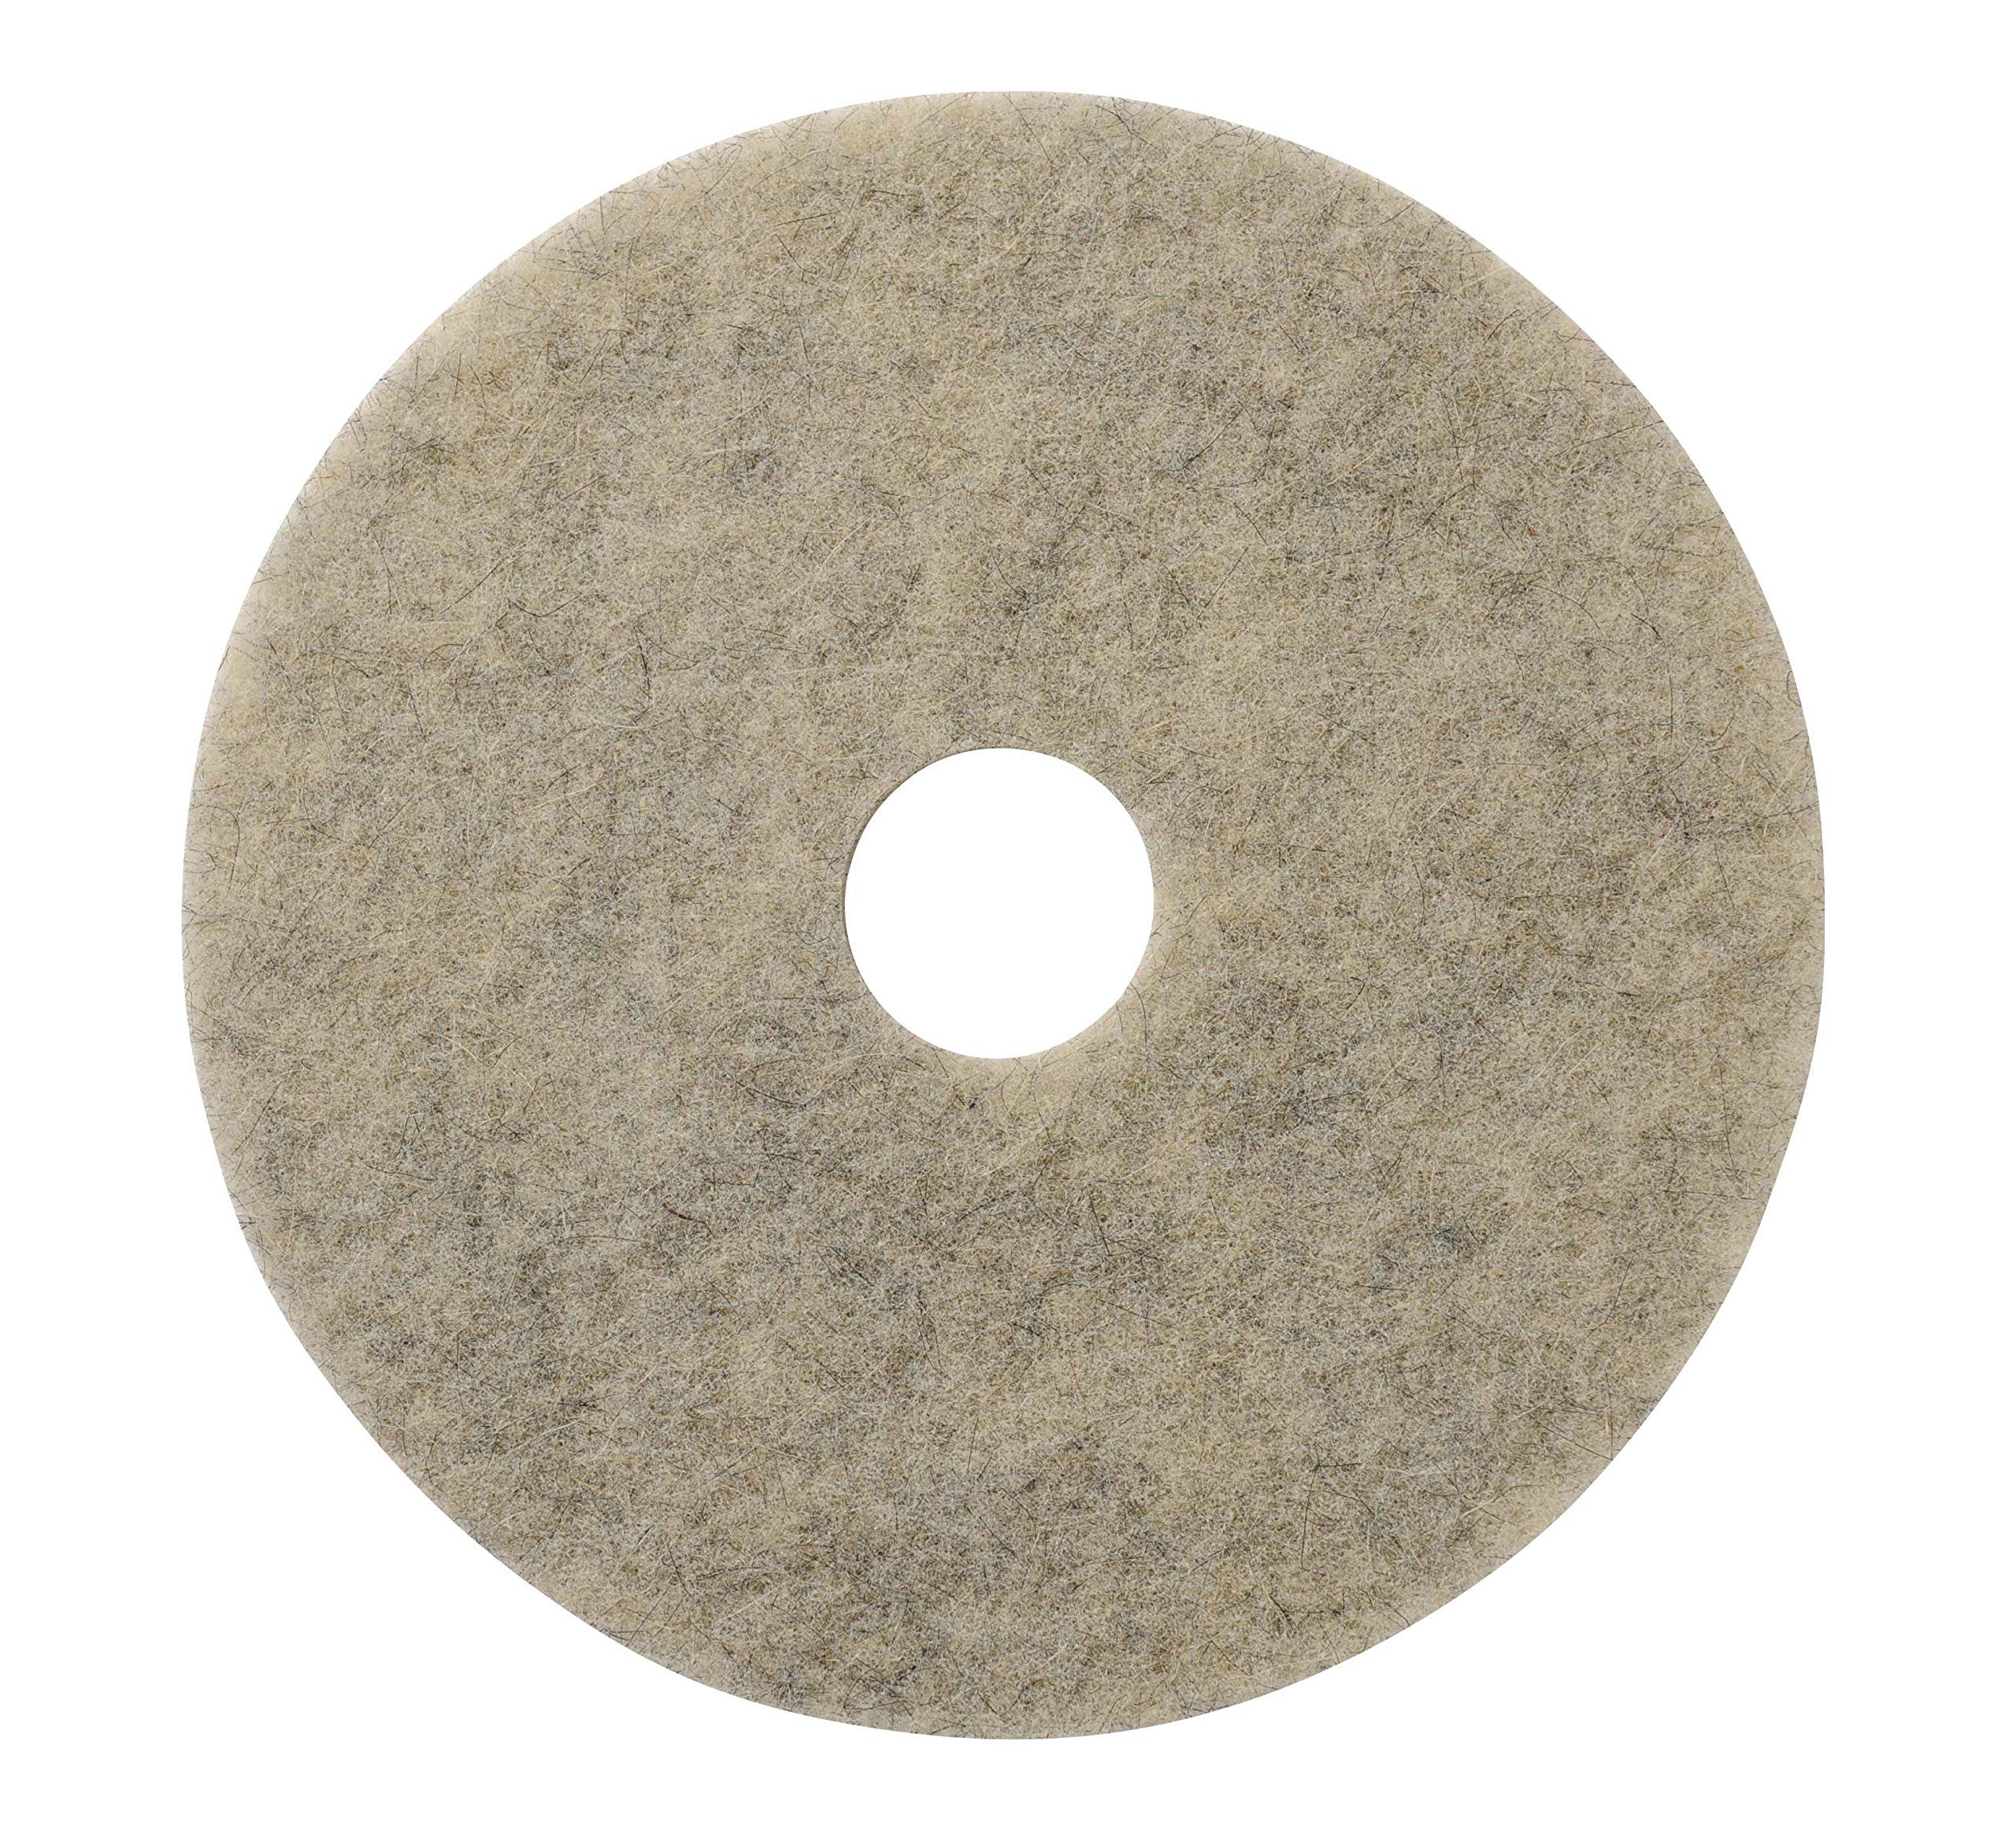 Glit/Microtron 401820 Jackaroo High Gloss Pad, Natural Fiber, 20'', Gray (Pack of 5)